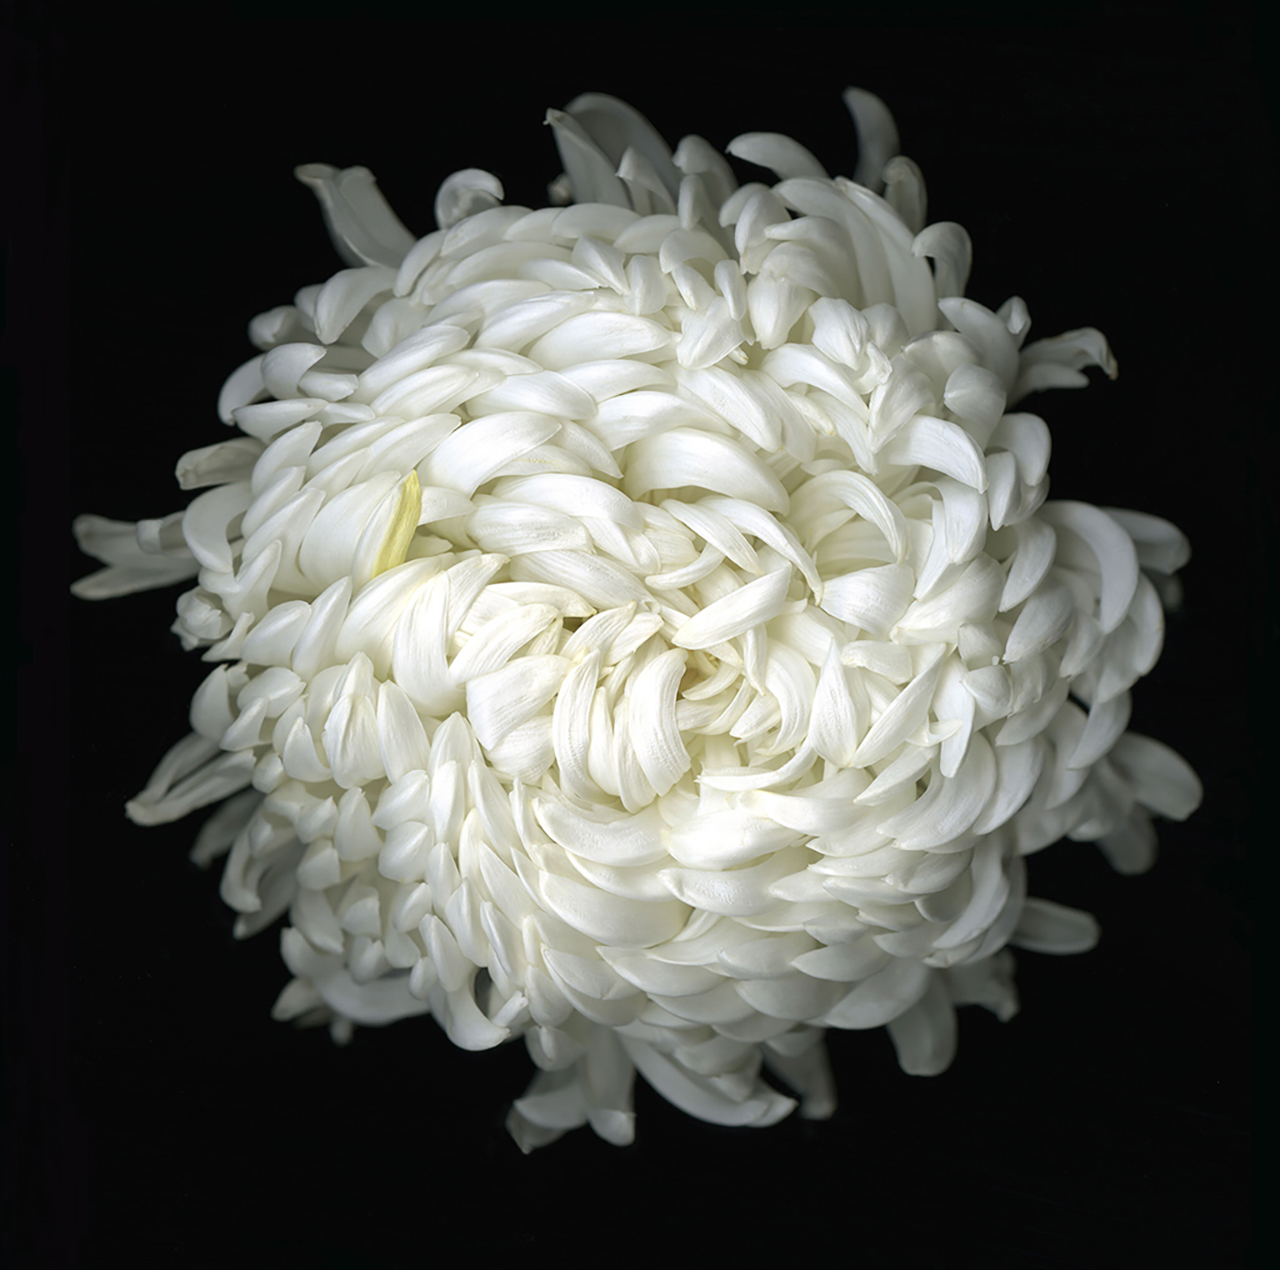 chrysanthemum2009.jpg